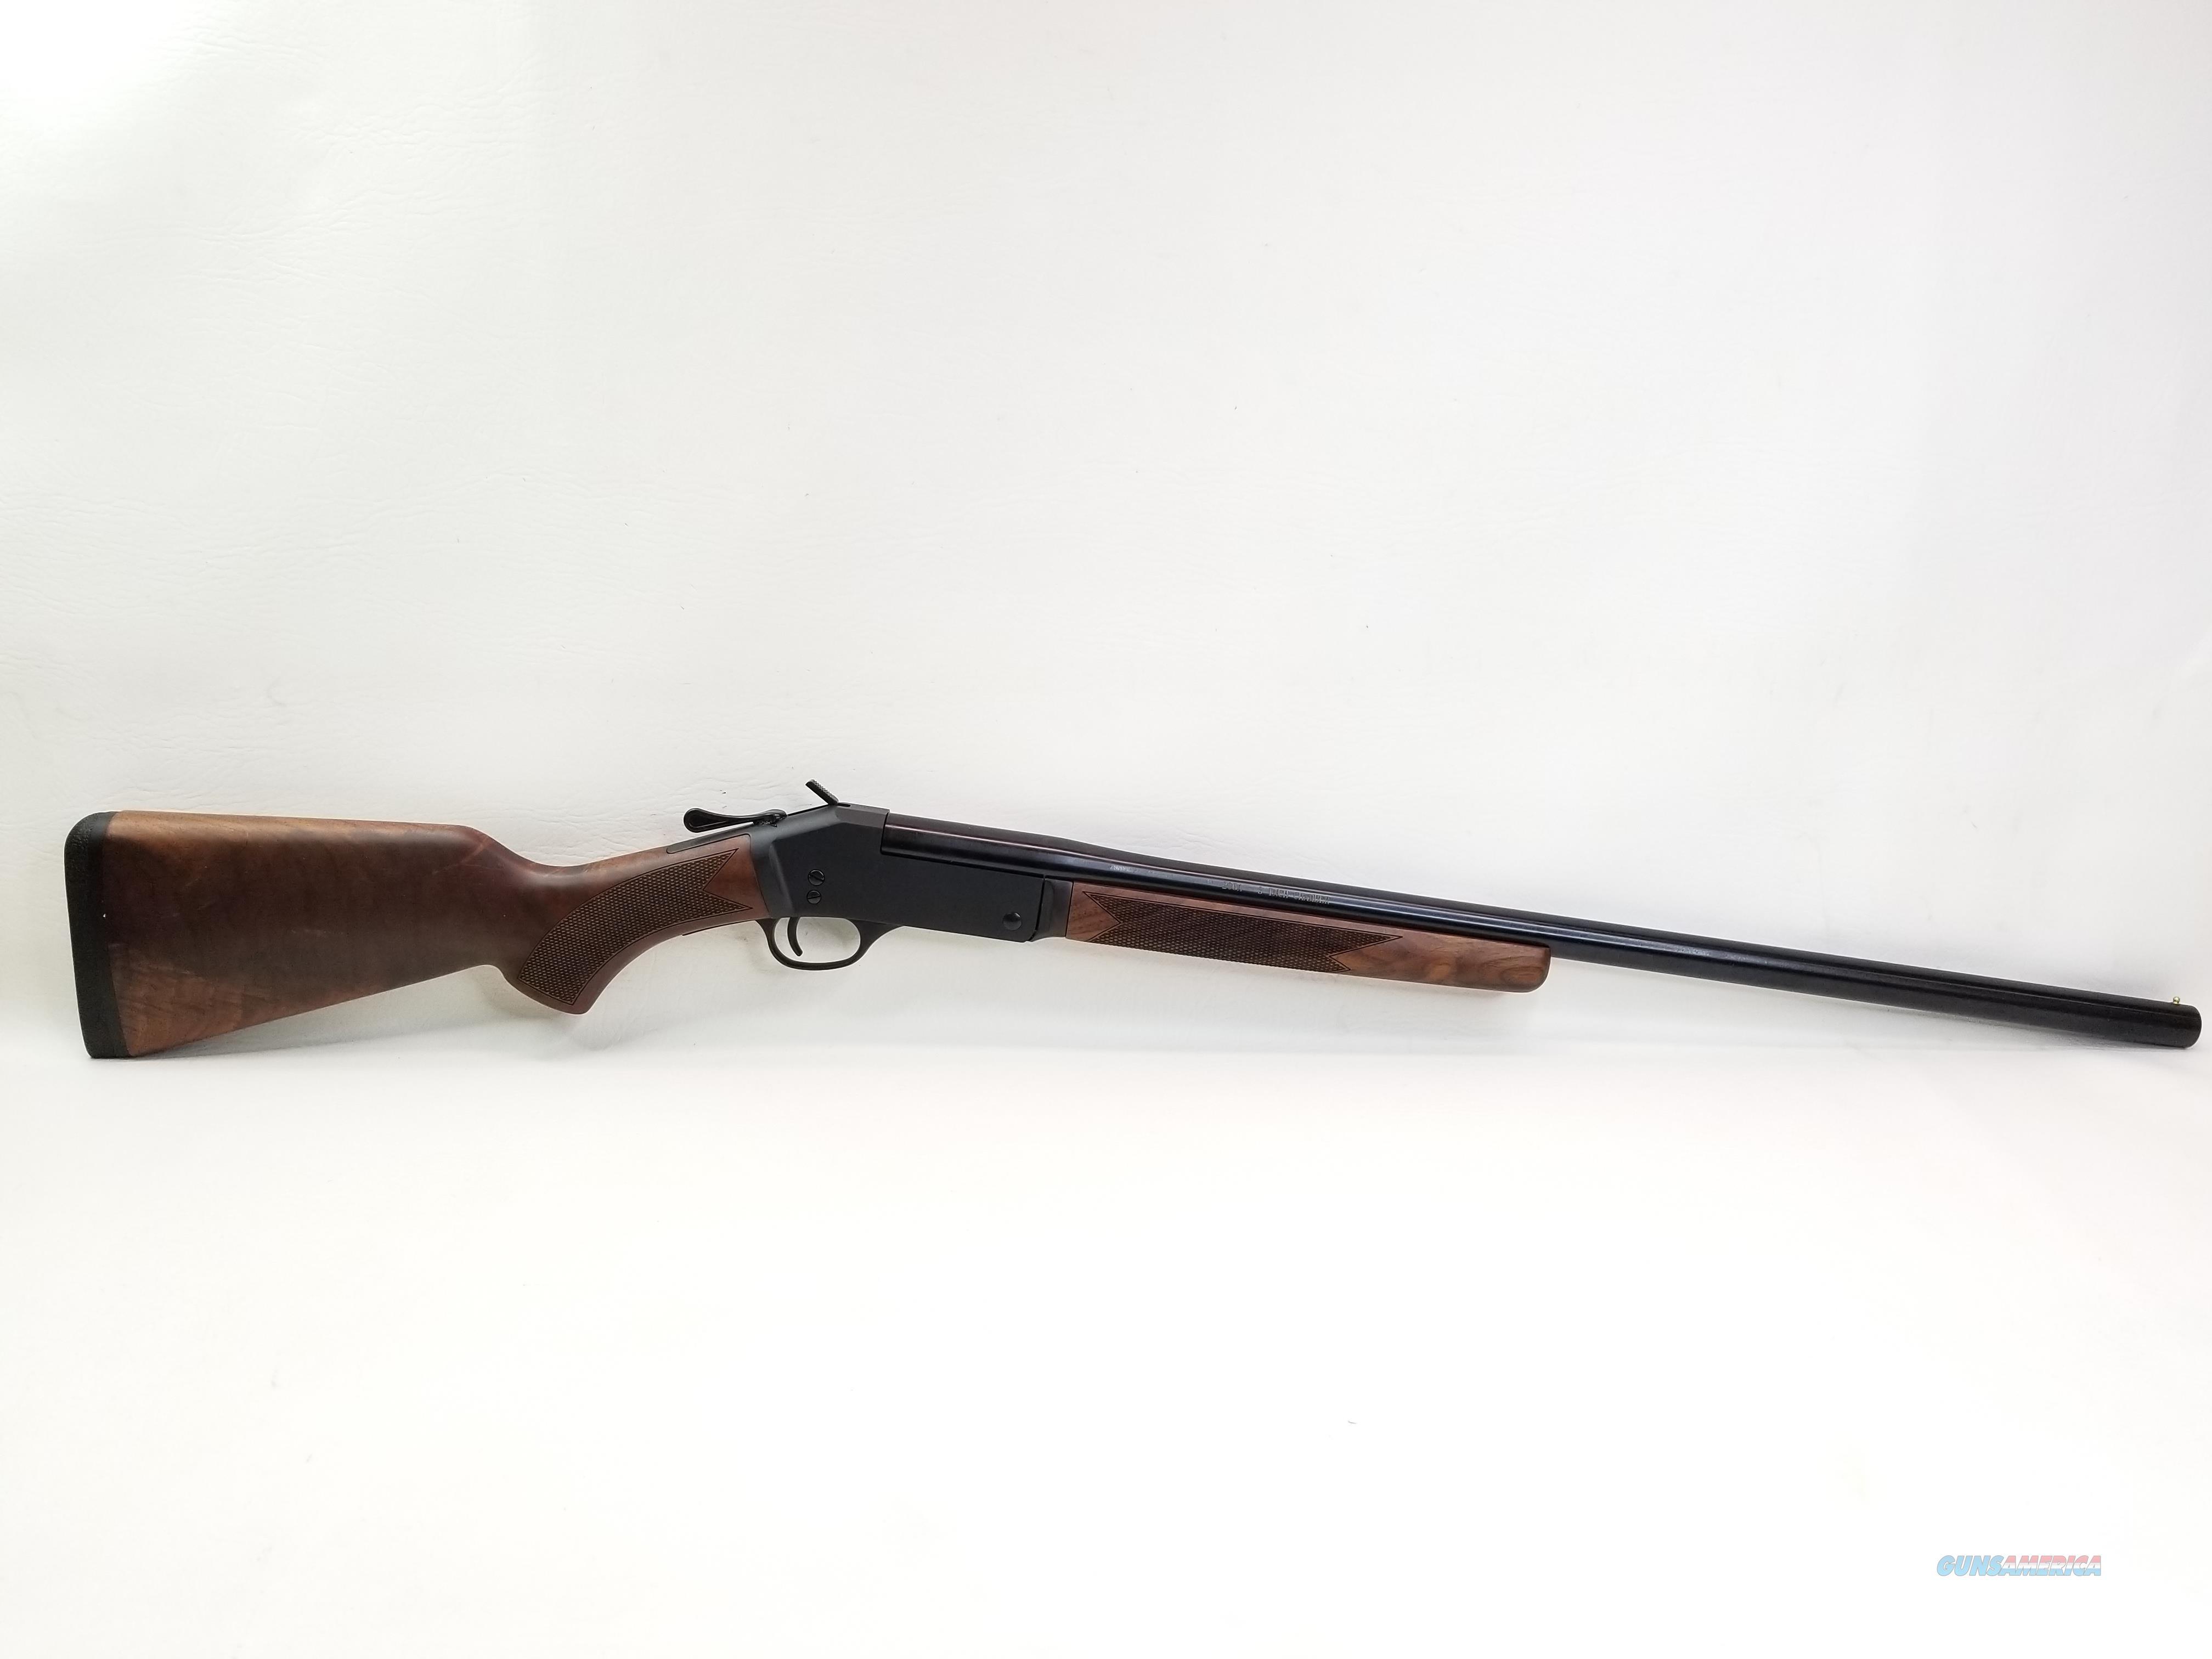 Singleshot Steel 20Ga 26In  H015-20  Guns > Rifles > Henry Rifles - Replica